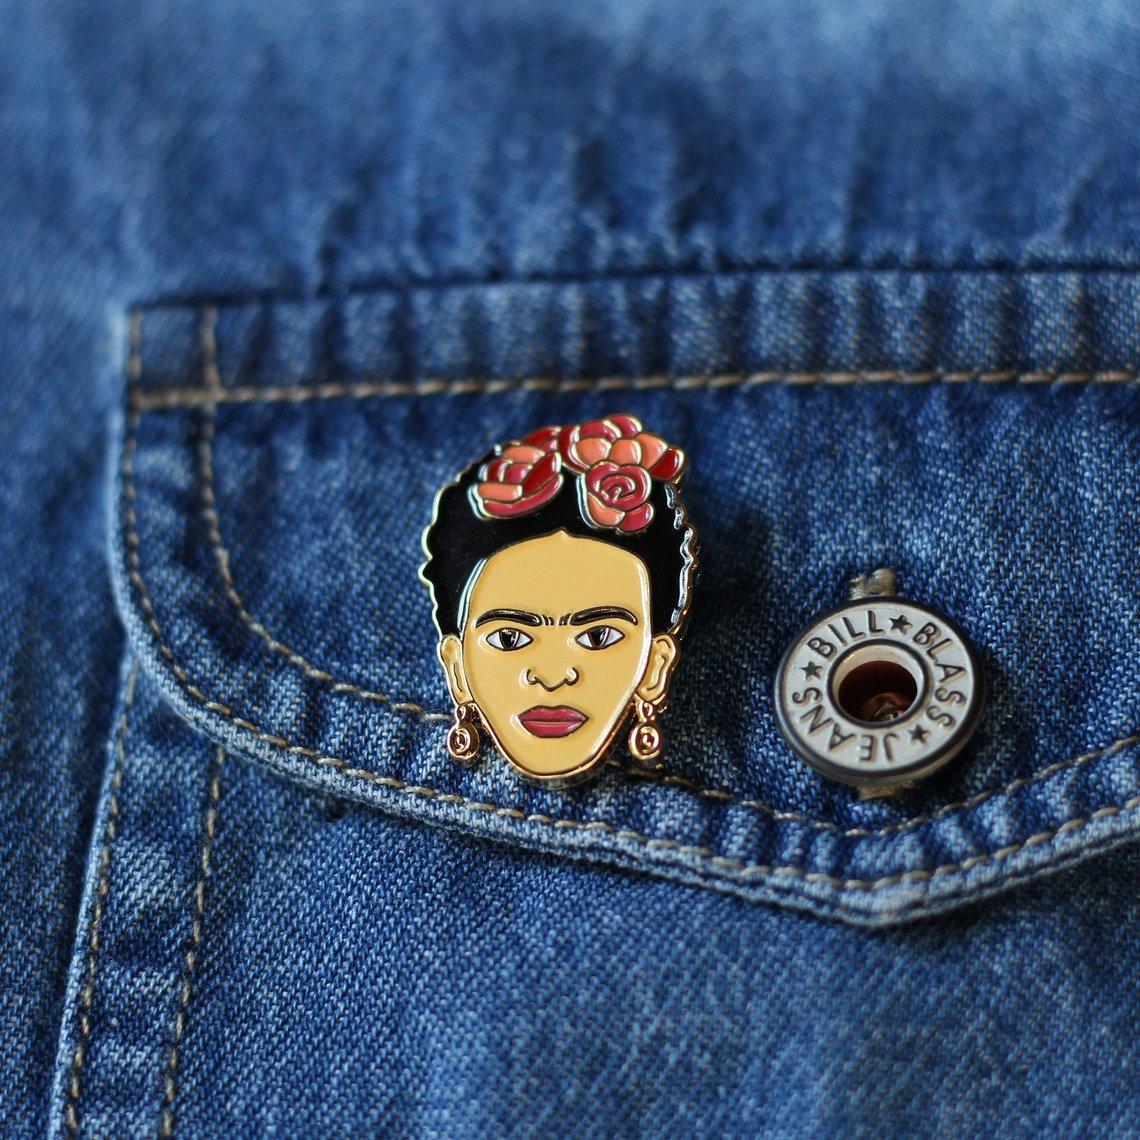 Frida Enamel Pin By RealSicStuff